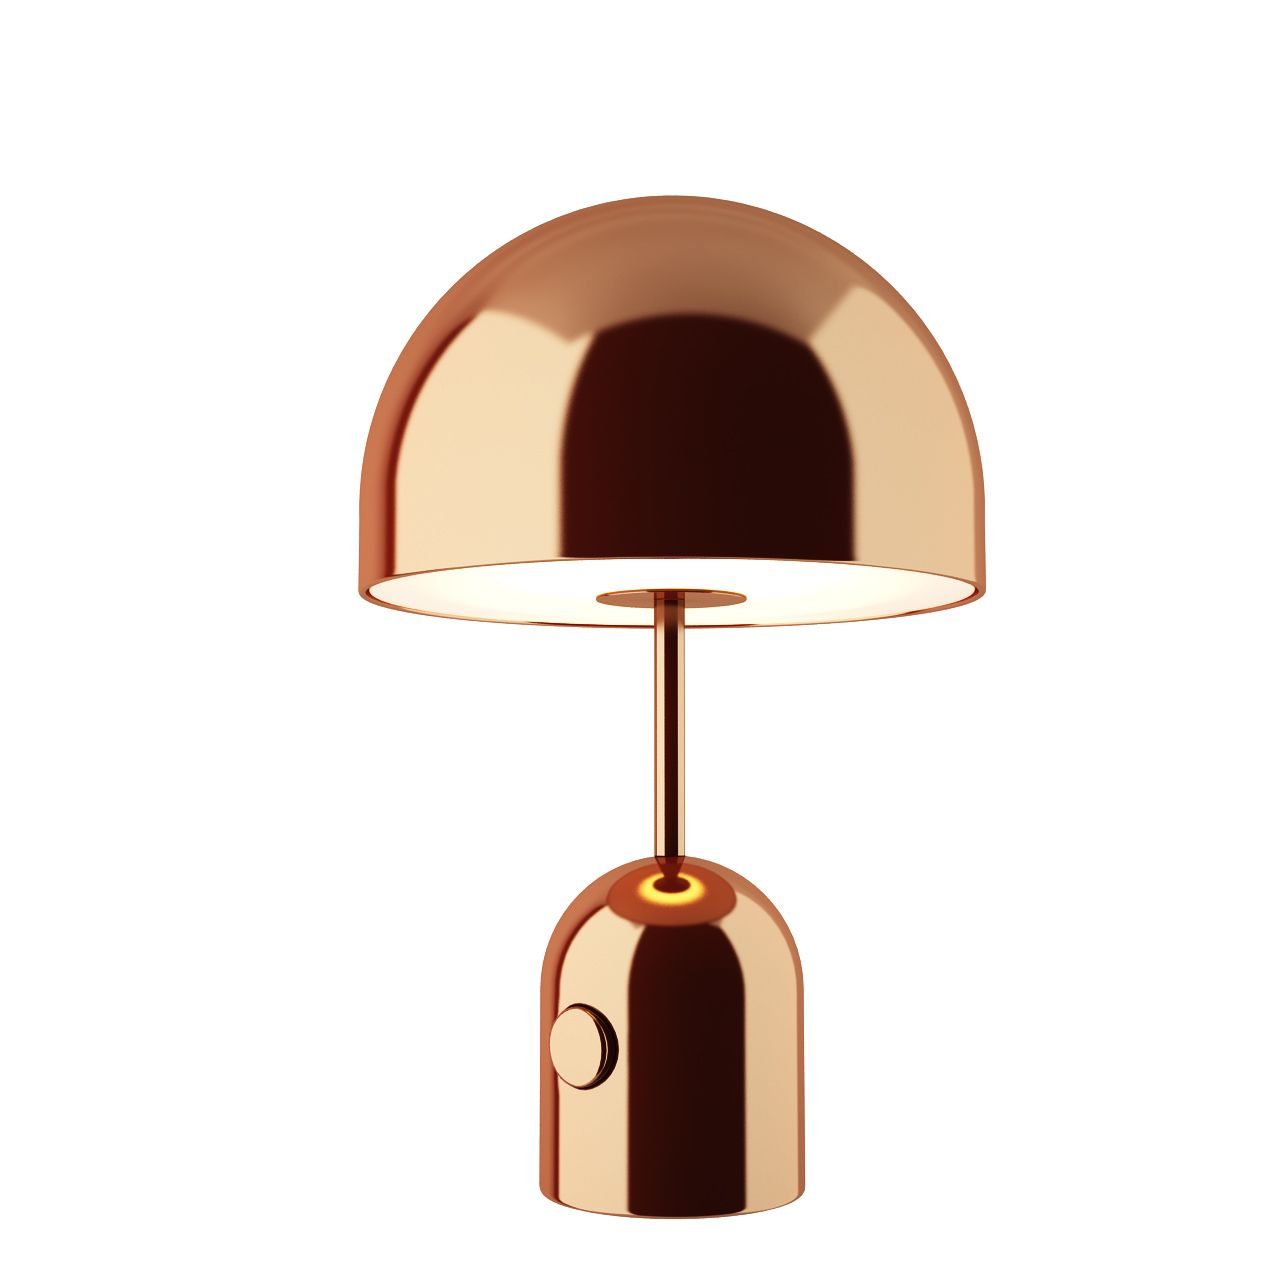 Bell Table Lamp Copper By Tom Dixon Dimensiva Table Lamp Lamp Led Pendant Lights